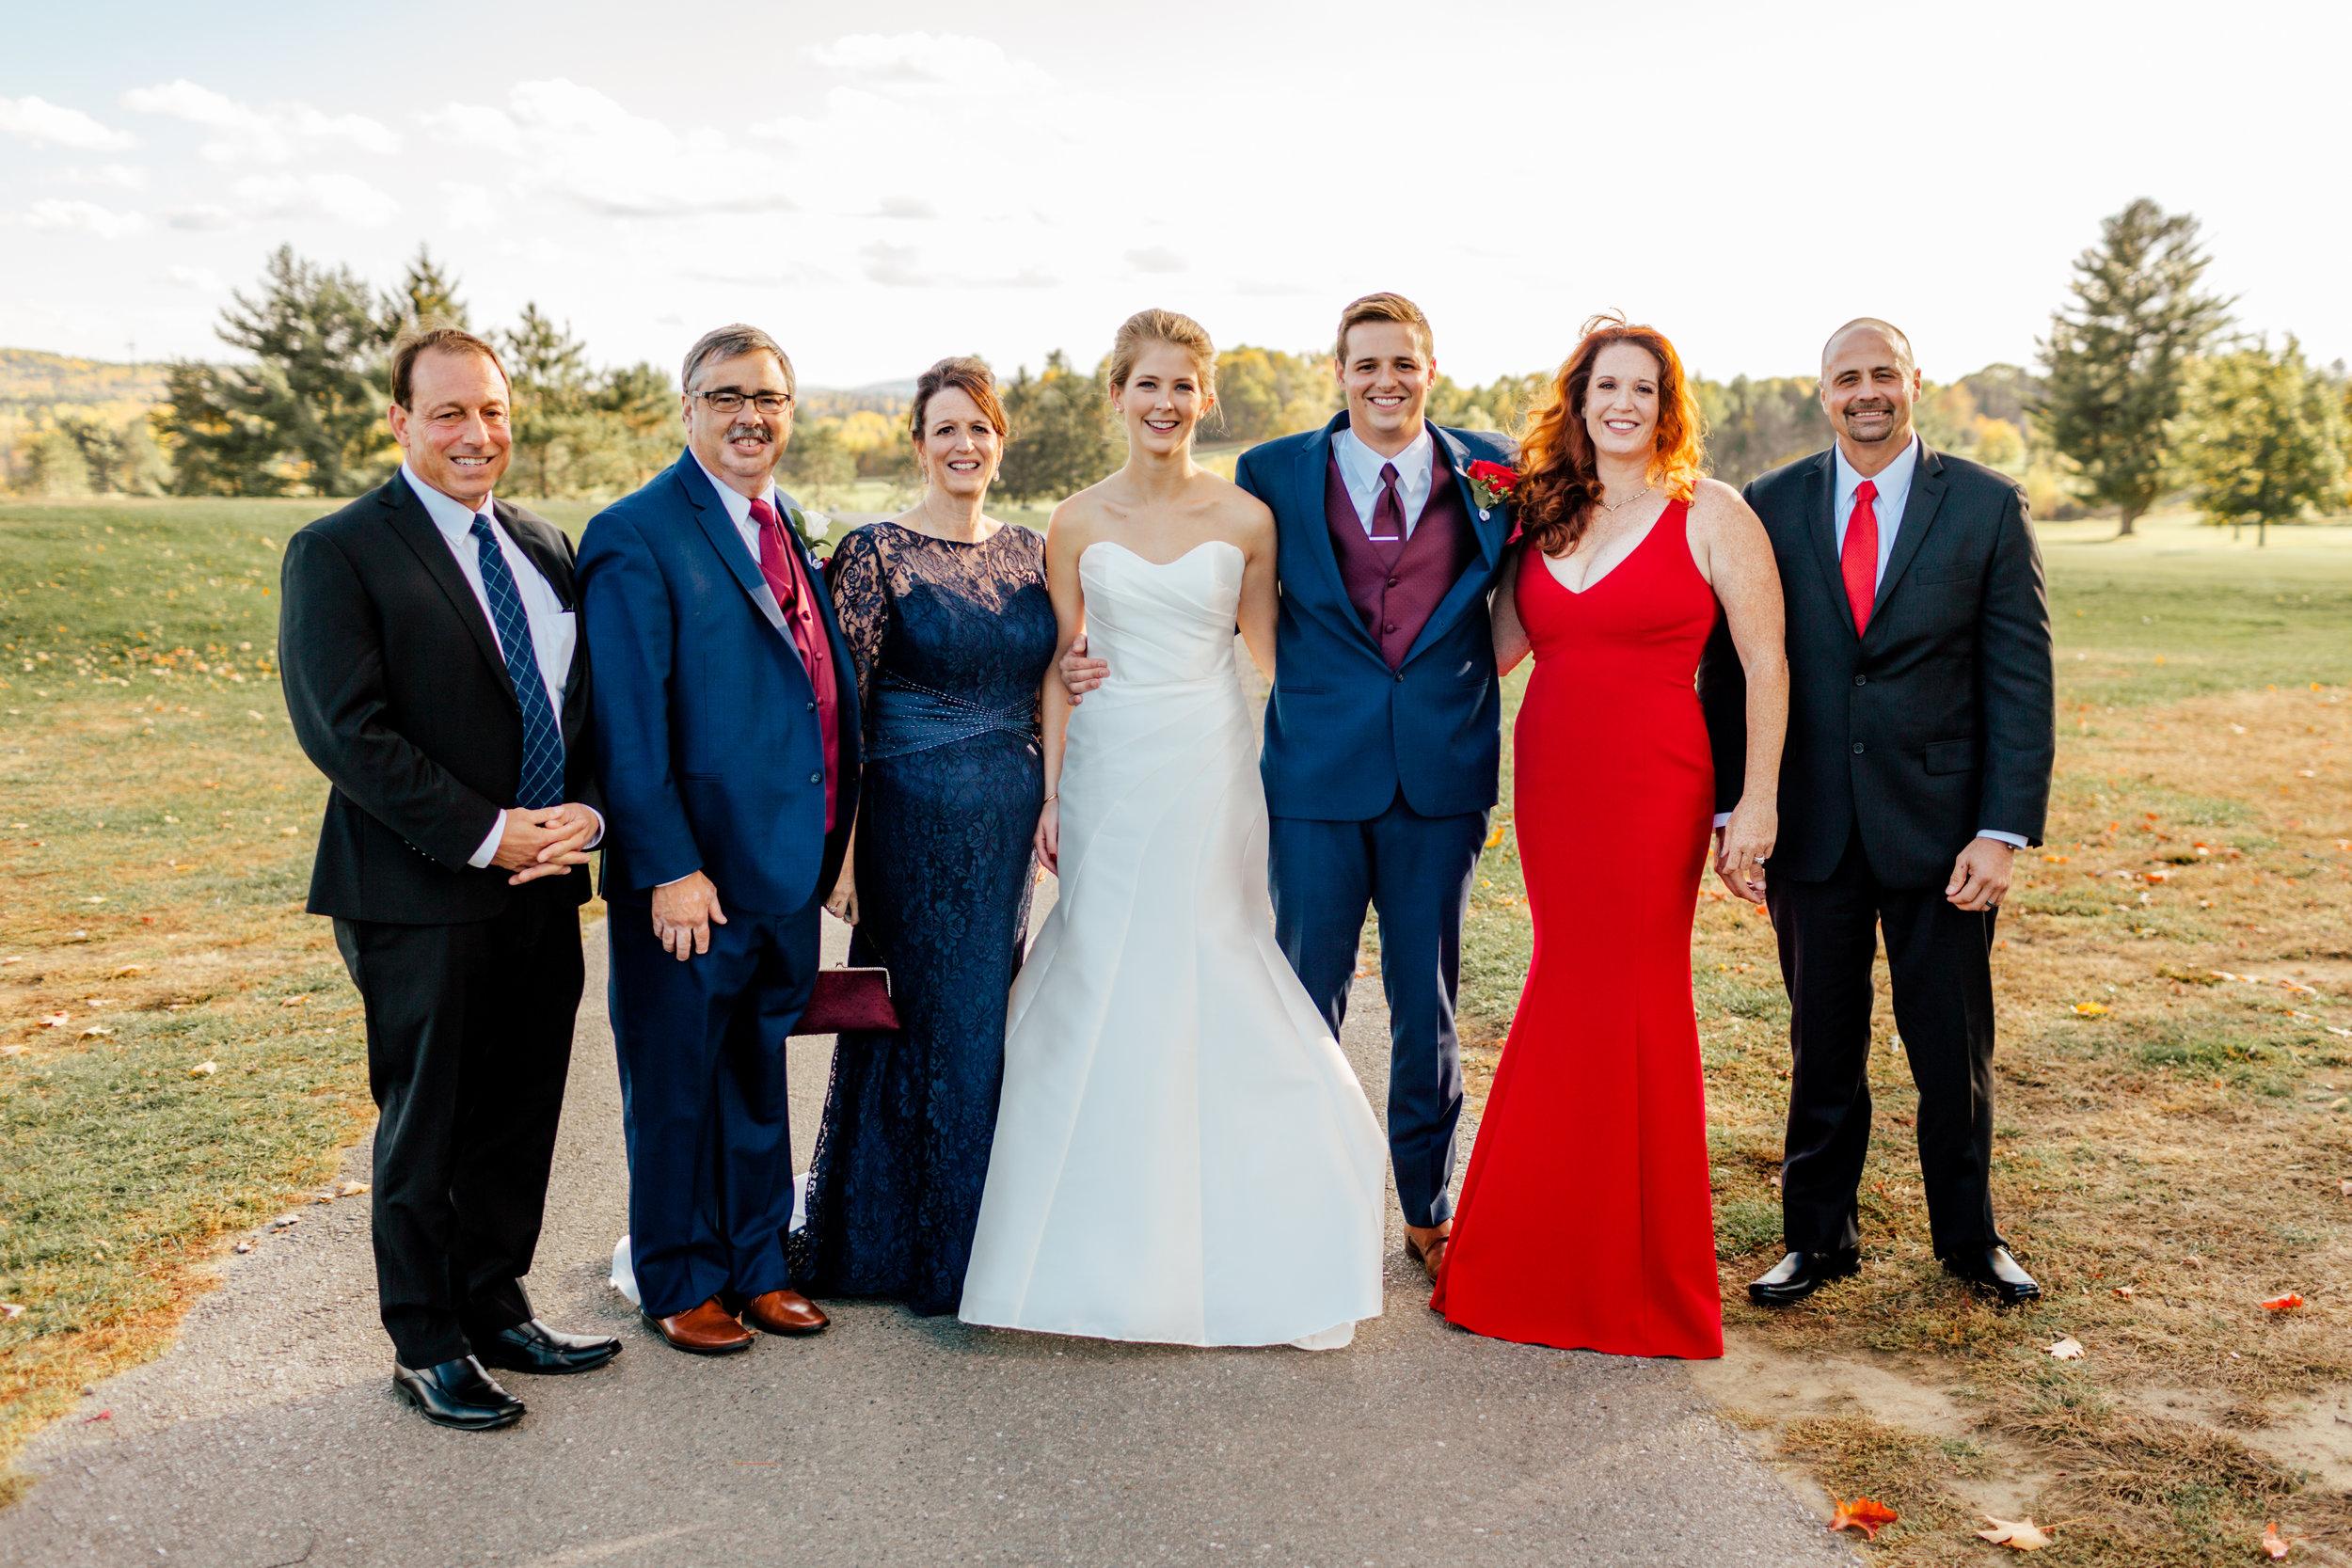 Jeff-and-Leslie-Wedding -8216.jpg